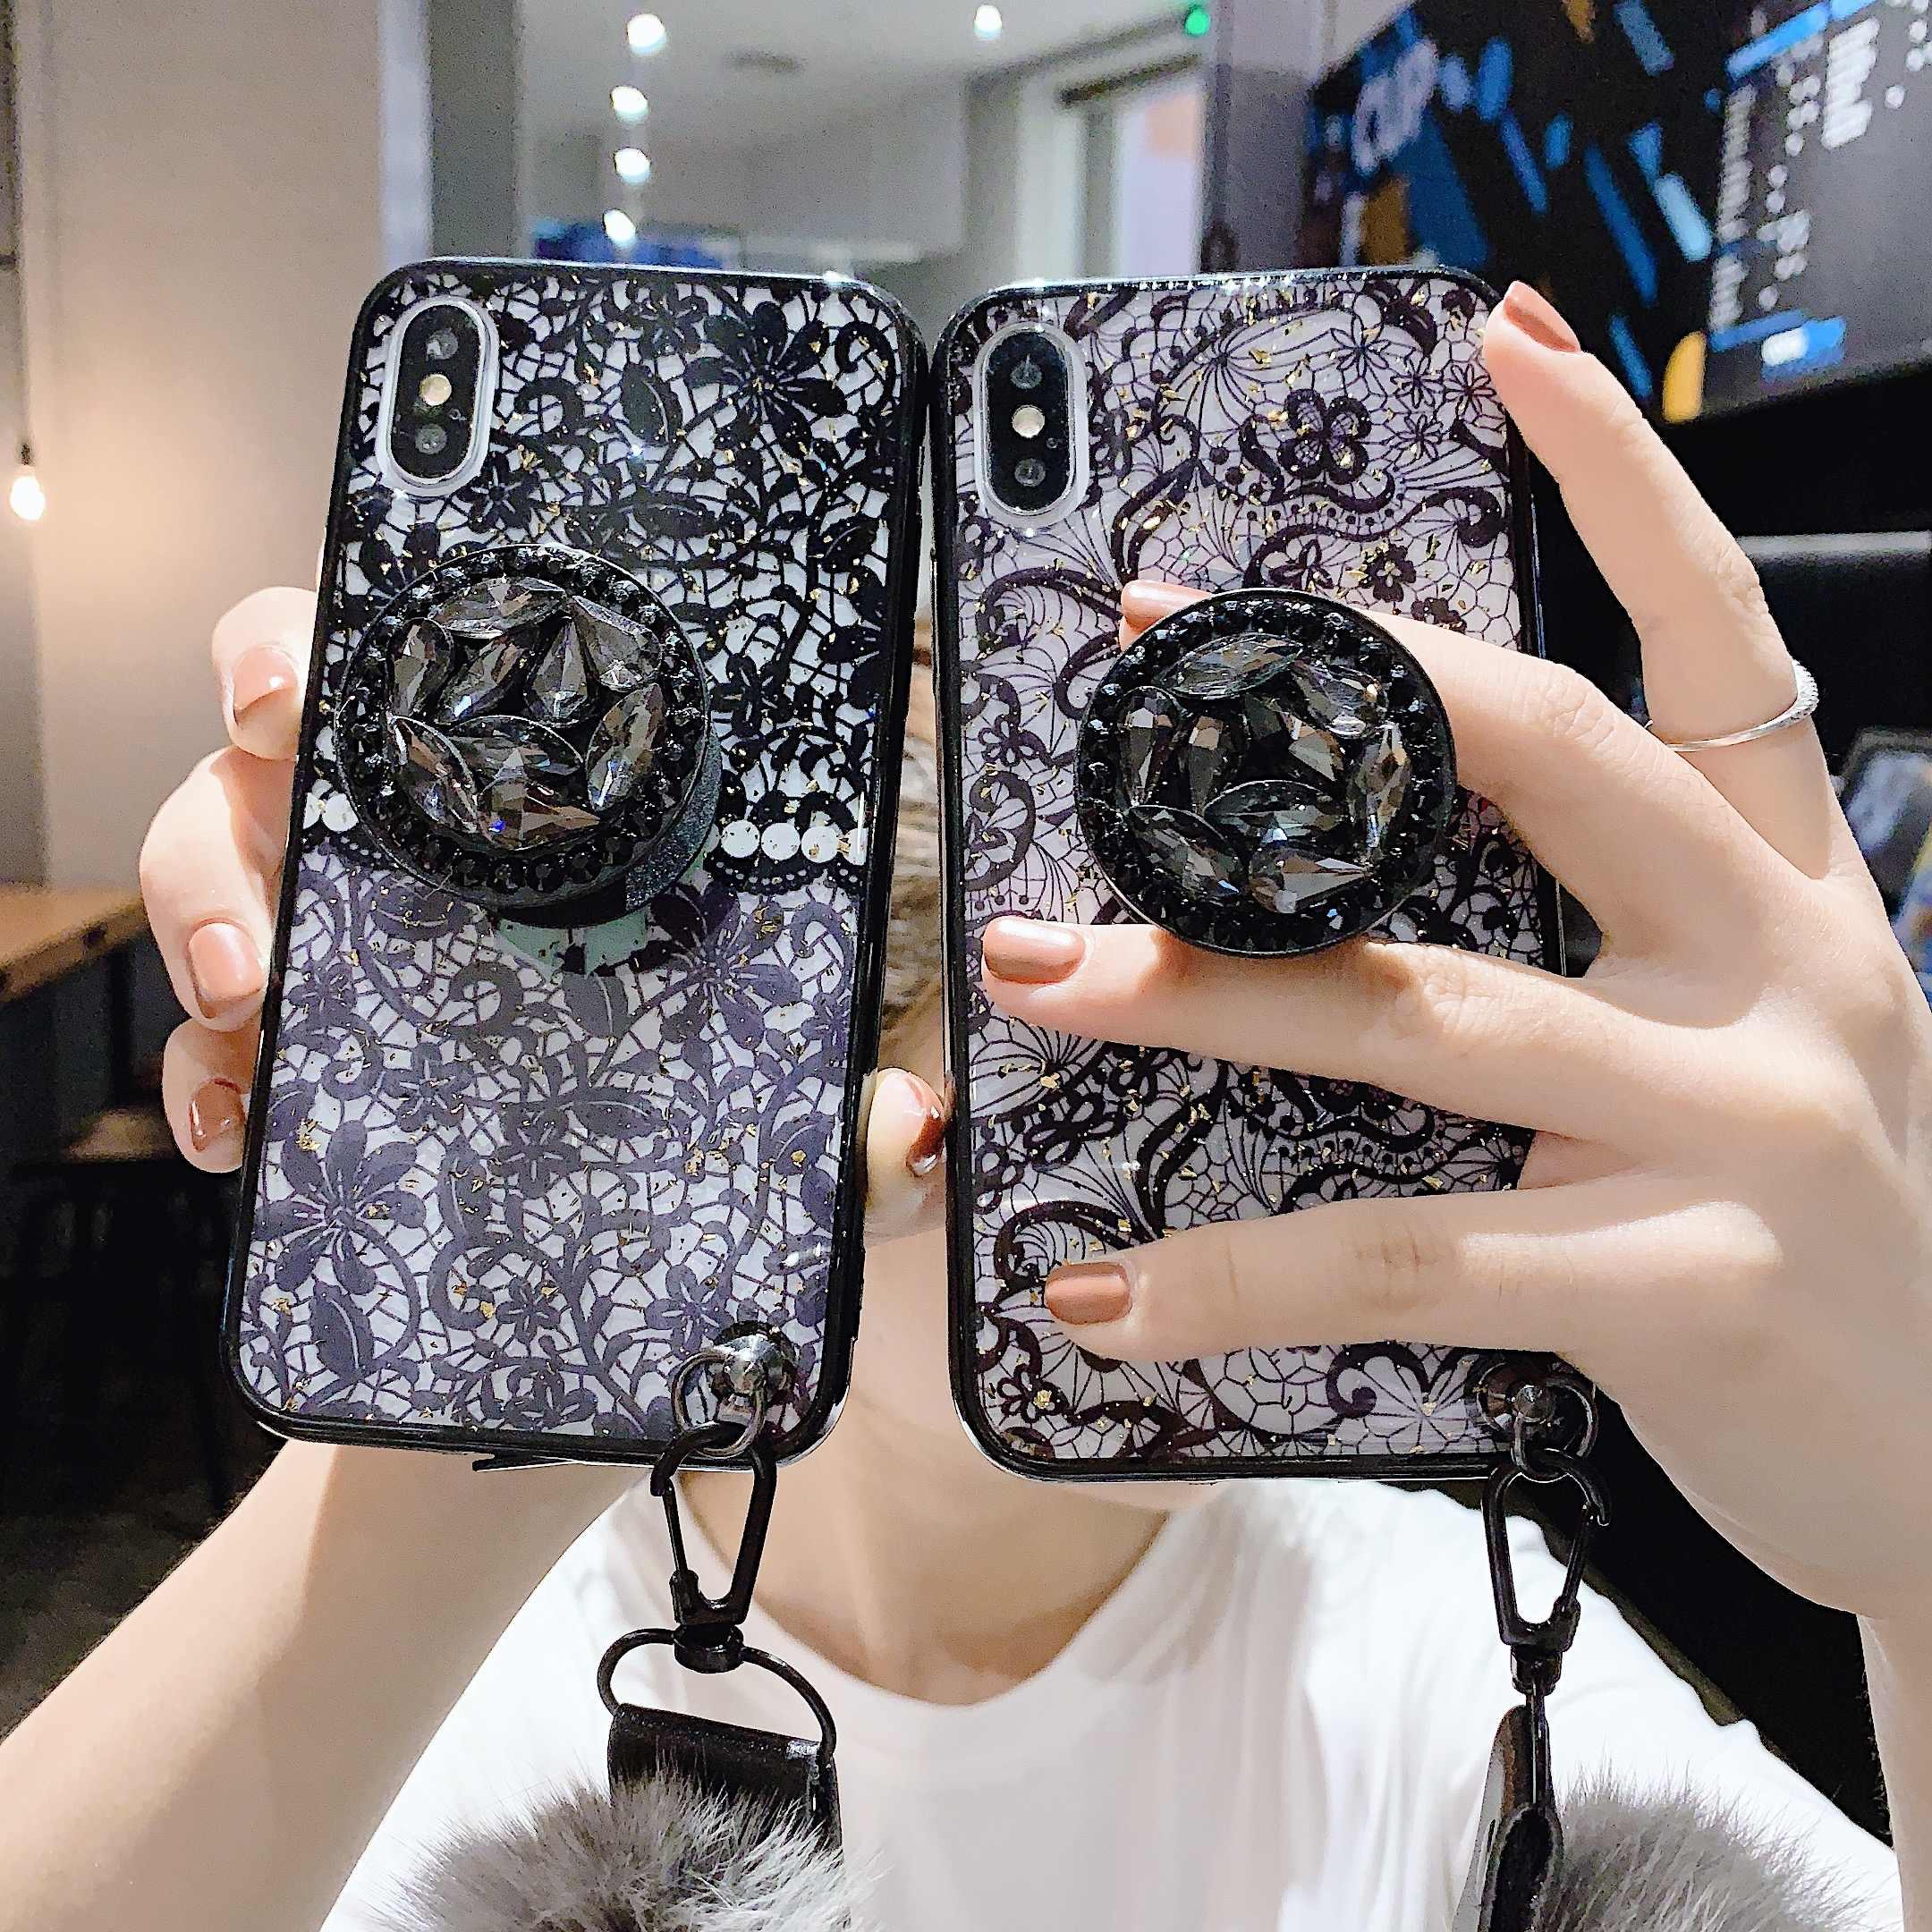 11ProMAX держатель Стенд мягкий меховой шар ремень Кружева чехол для iPhone 11 Pro MAX 6 6splus 8Plus 7 Plus XSMAX XR XS Мягкий ТПУ чехол для телефона